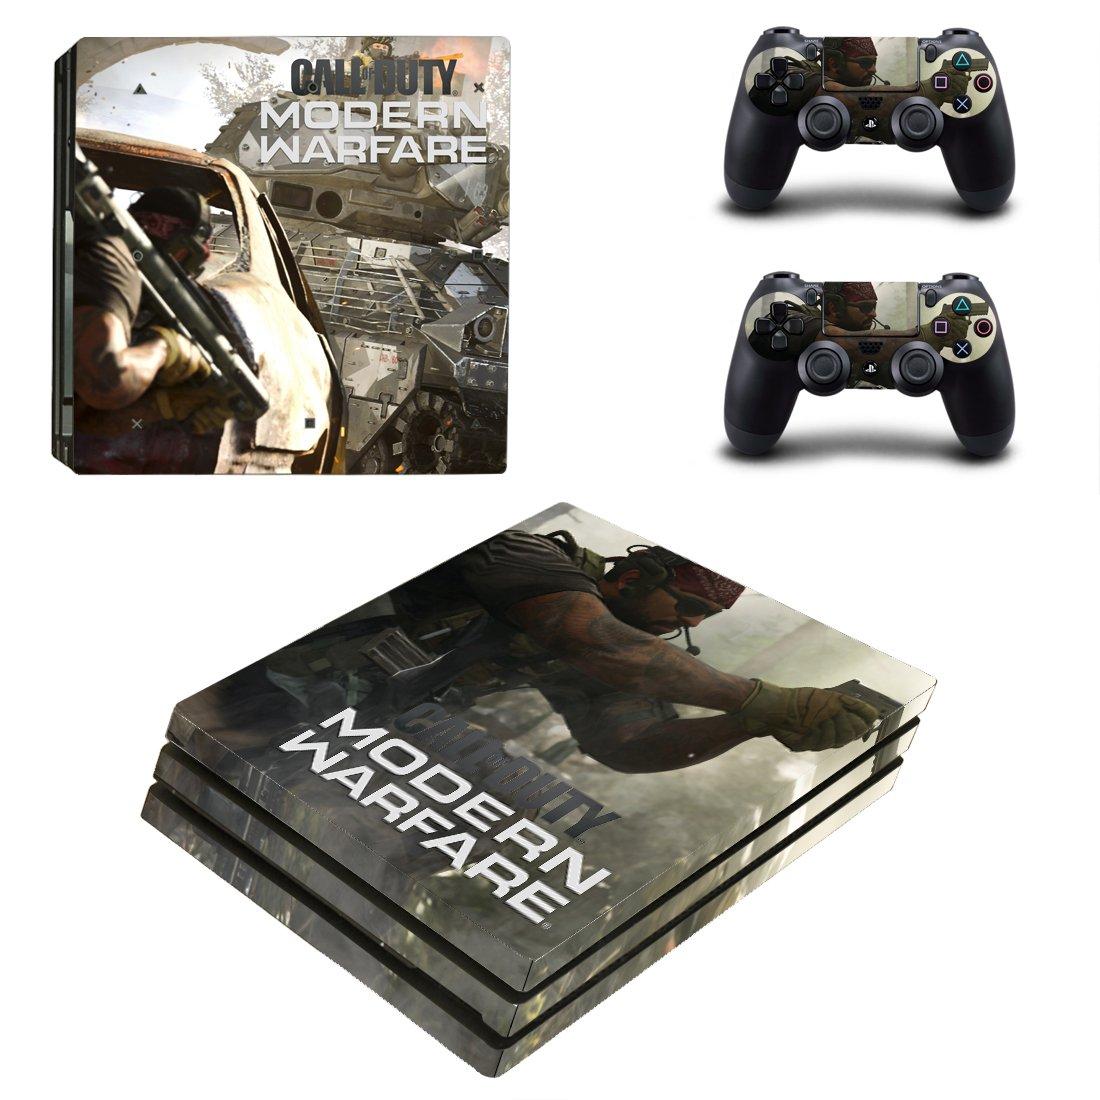 Vinyl Modern Warfare Decal Skin Sticker for Sony PlayStation 4 Pro